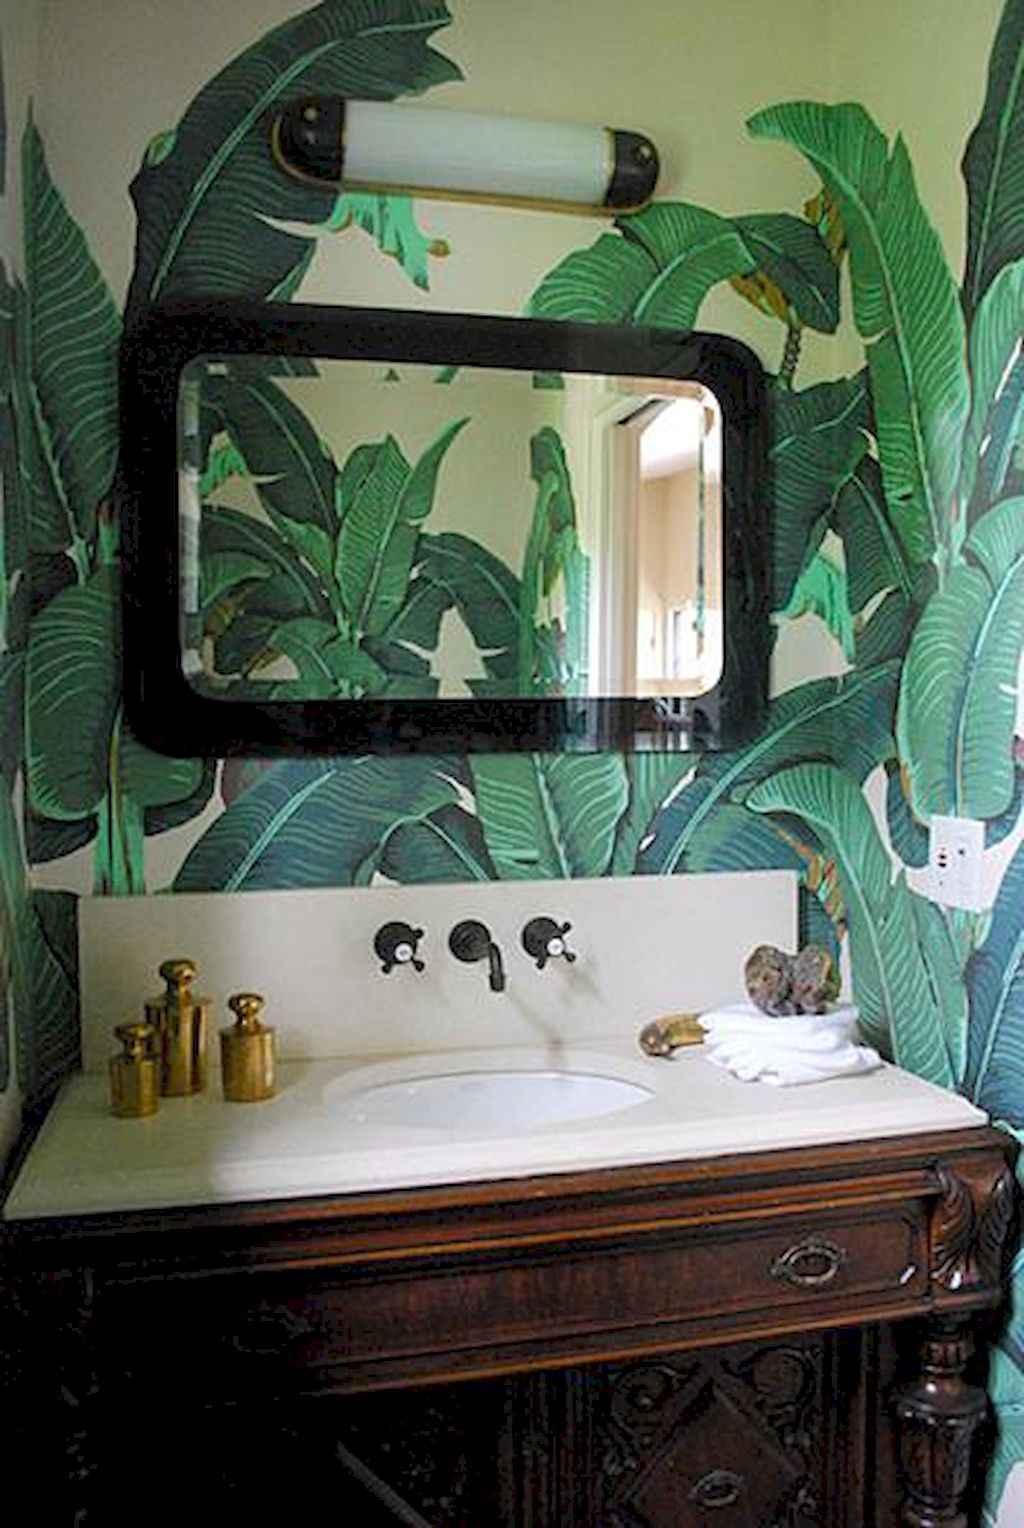 60 beautiful vintage powder room ideas 5 for 60s bedroom ideas